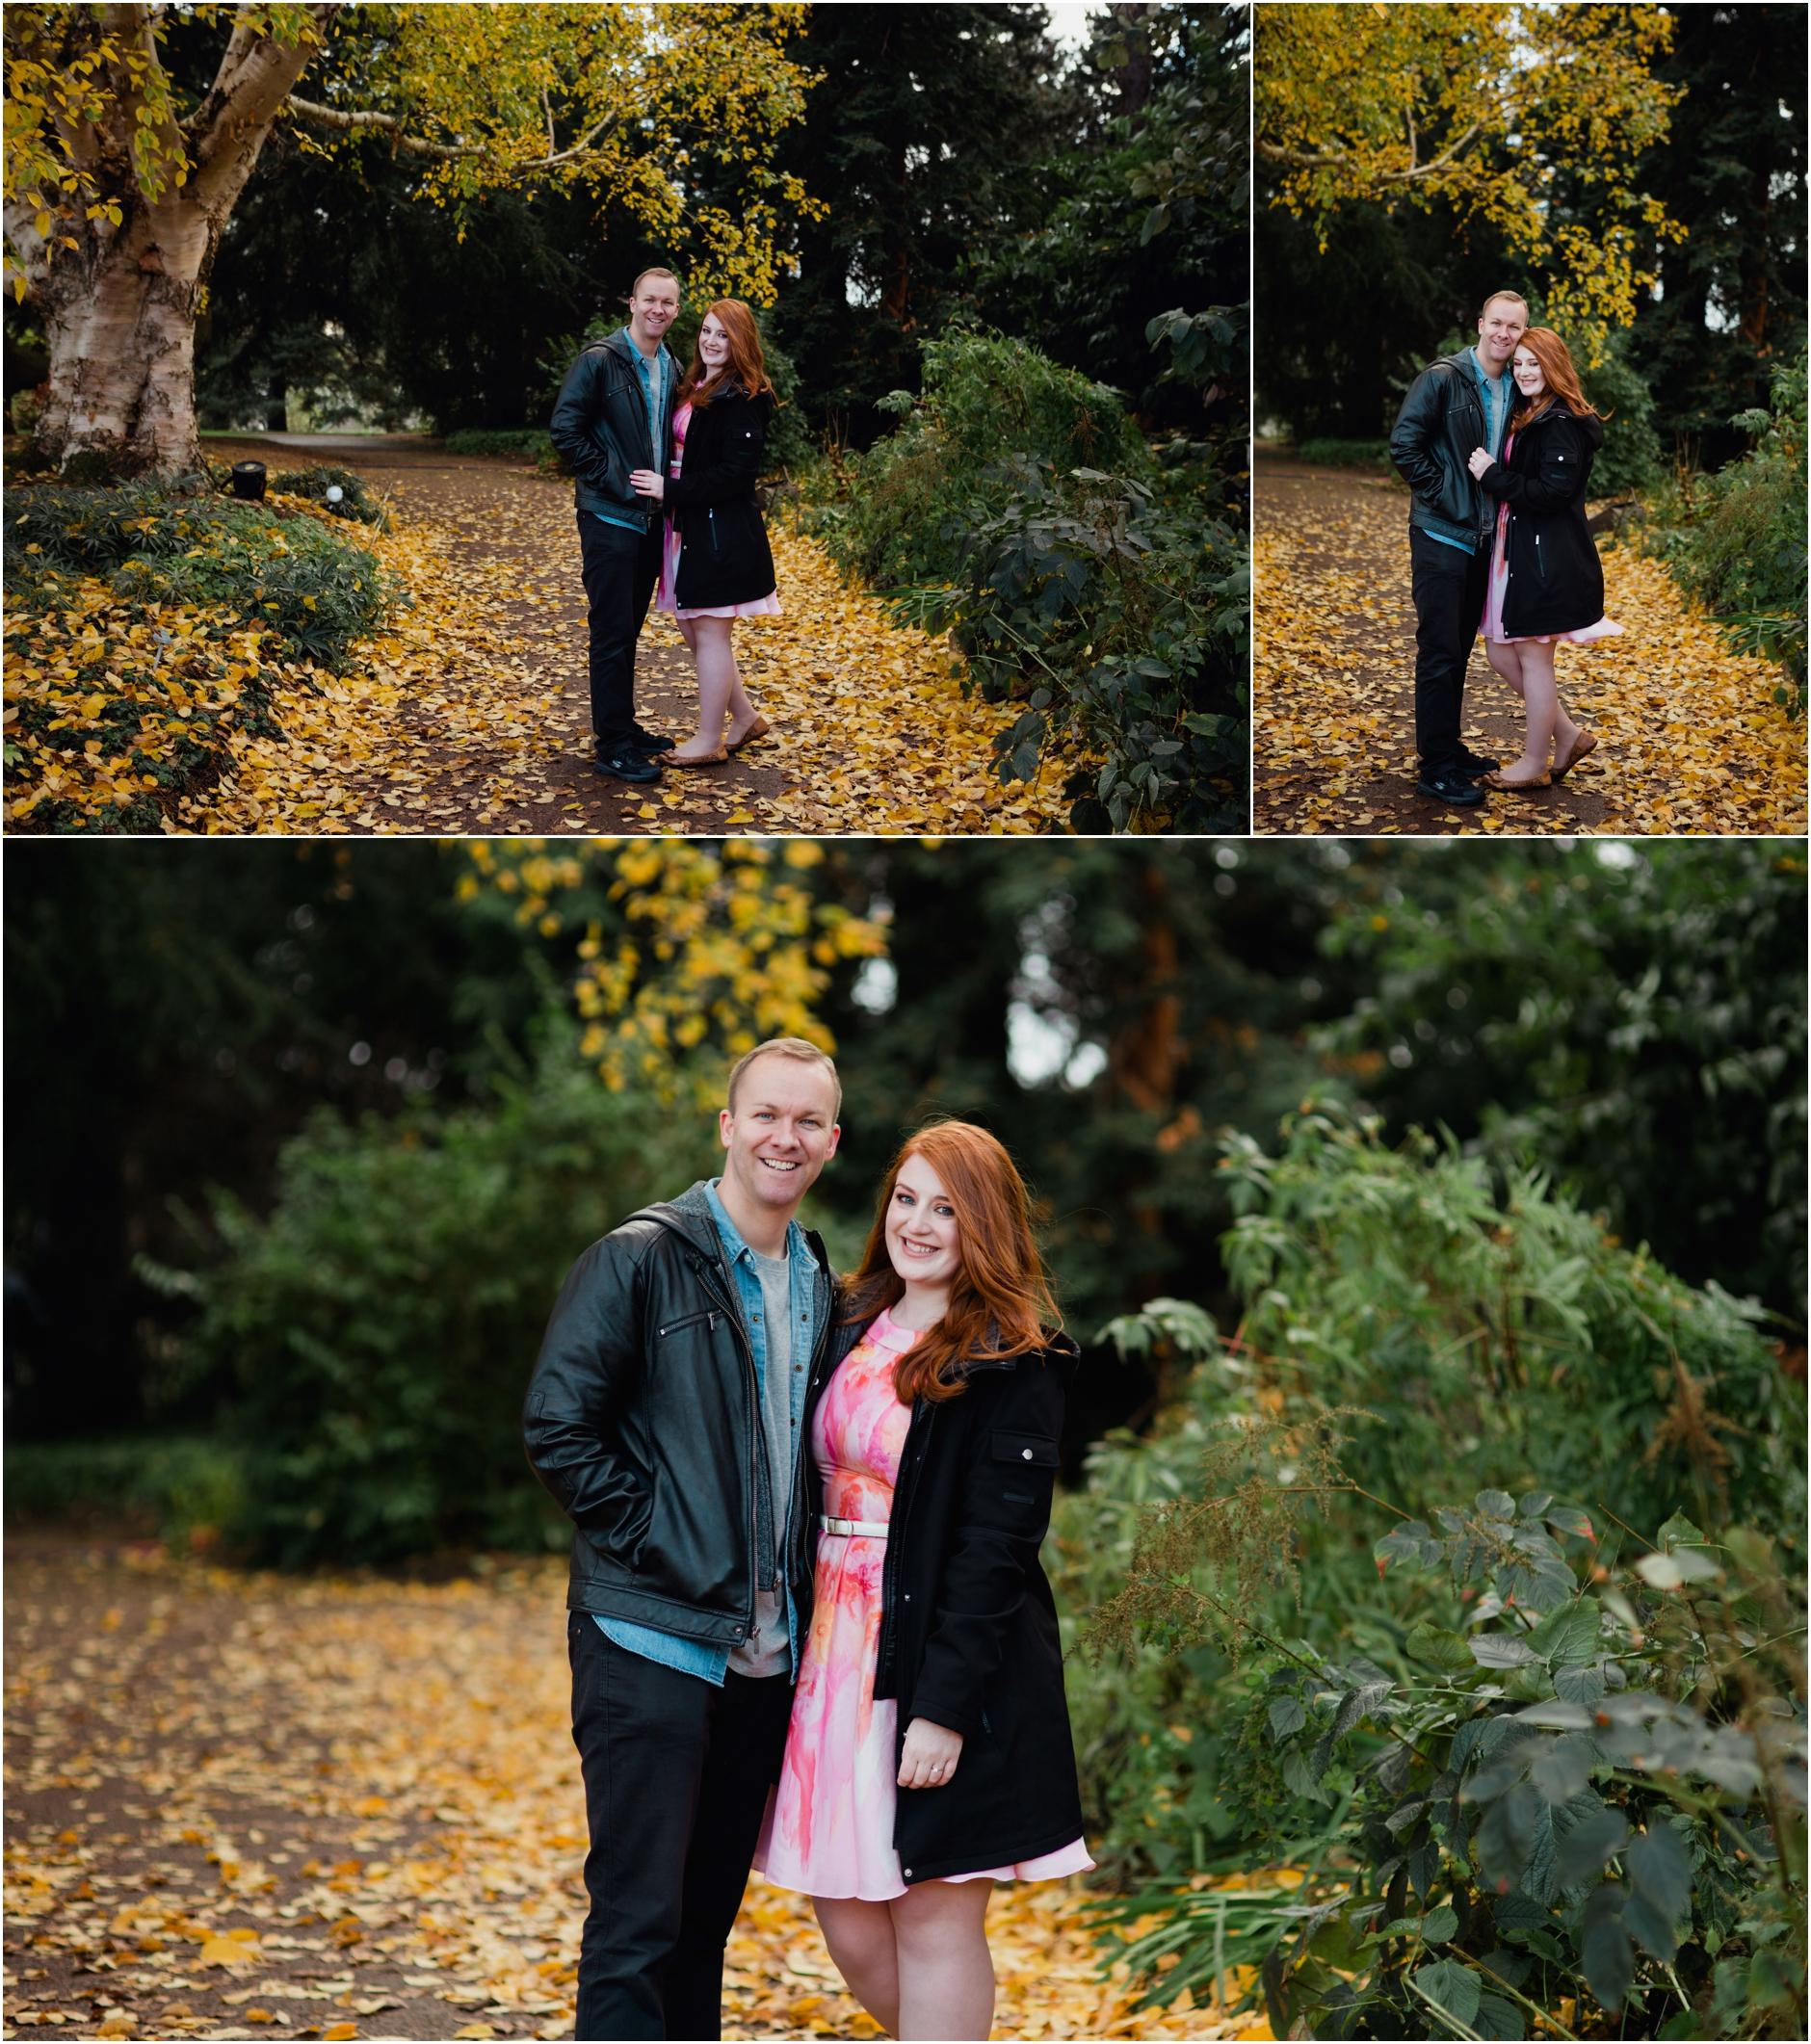 edinburgh wedding photographer pre wedding shoot engagement